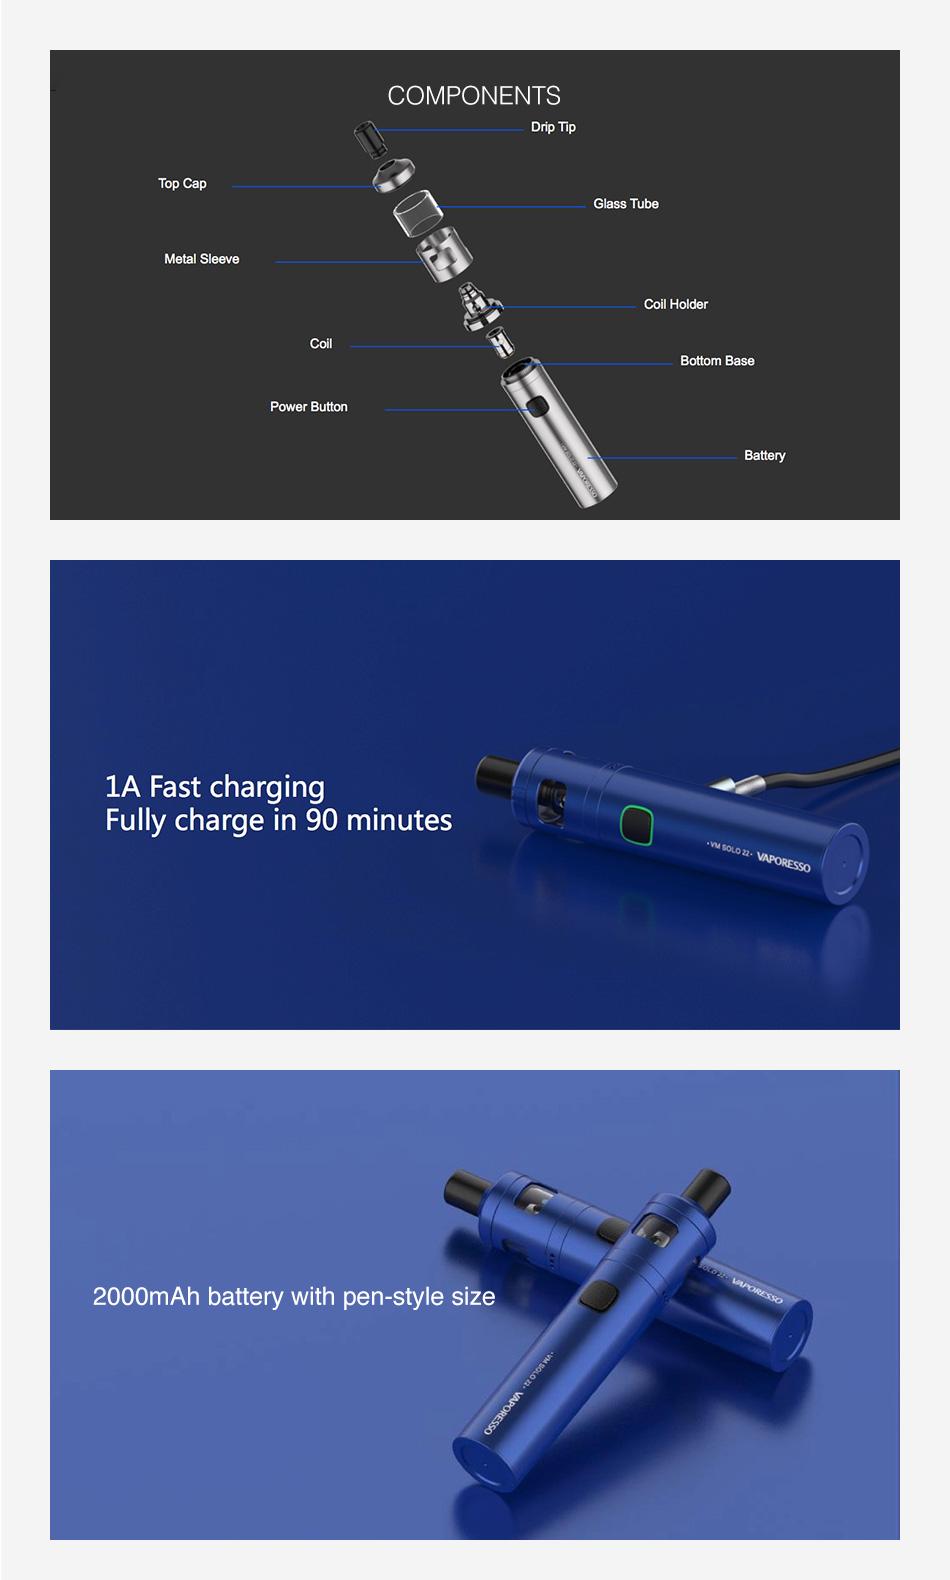 Vaporesso VM Solo Kit